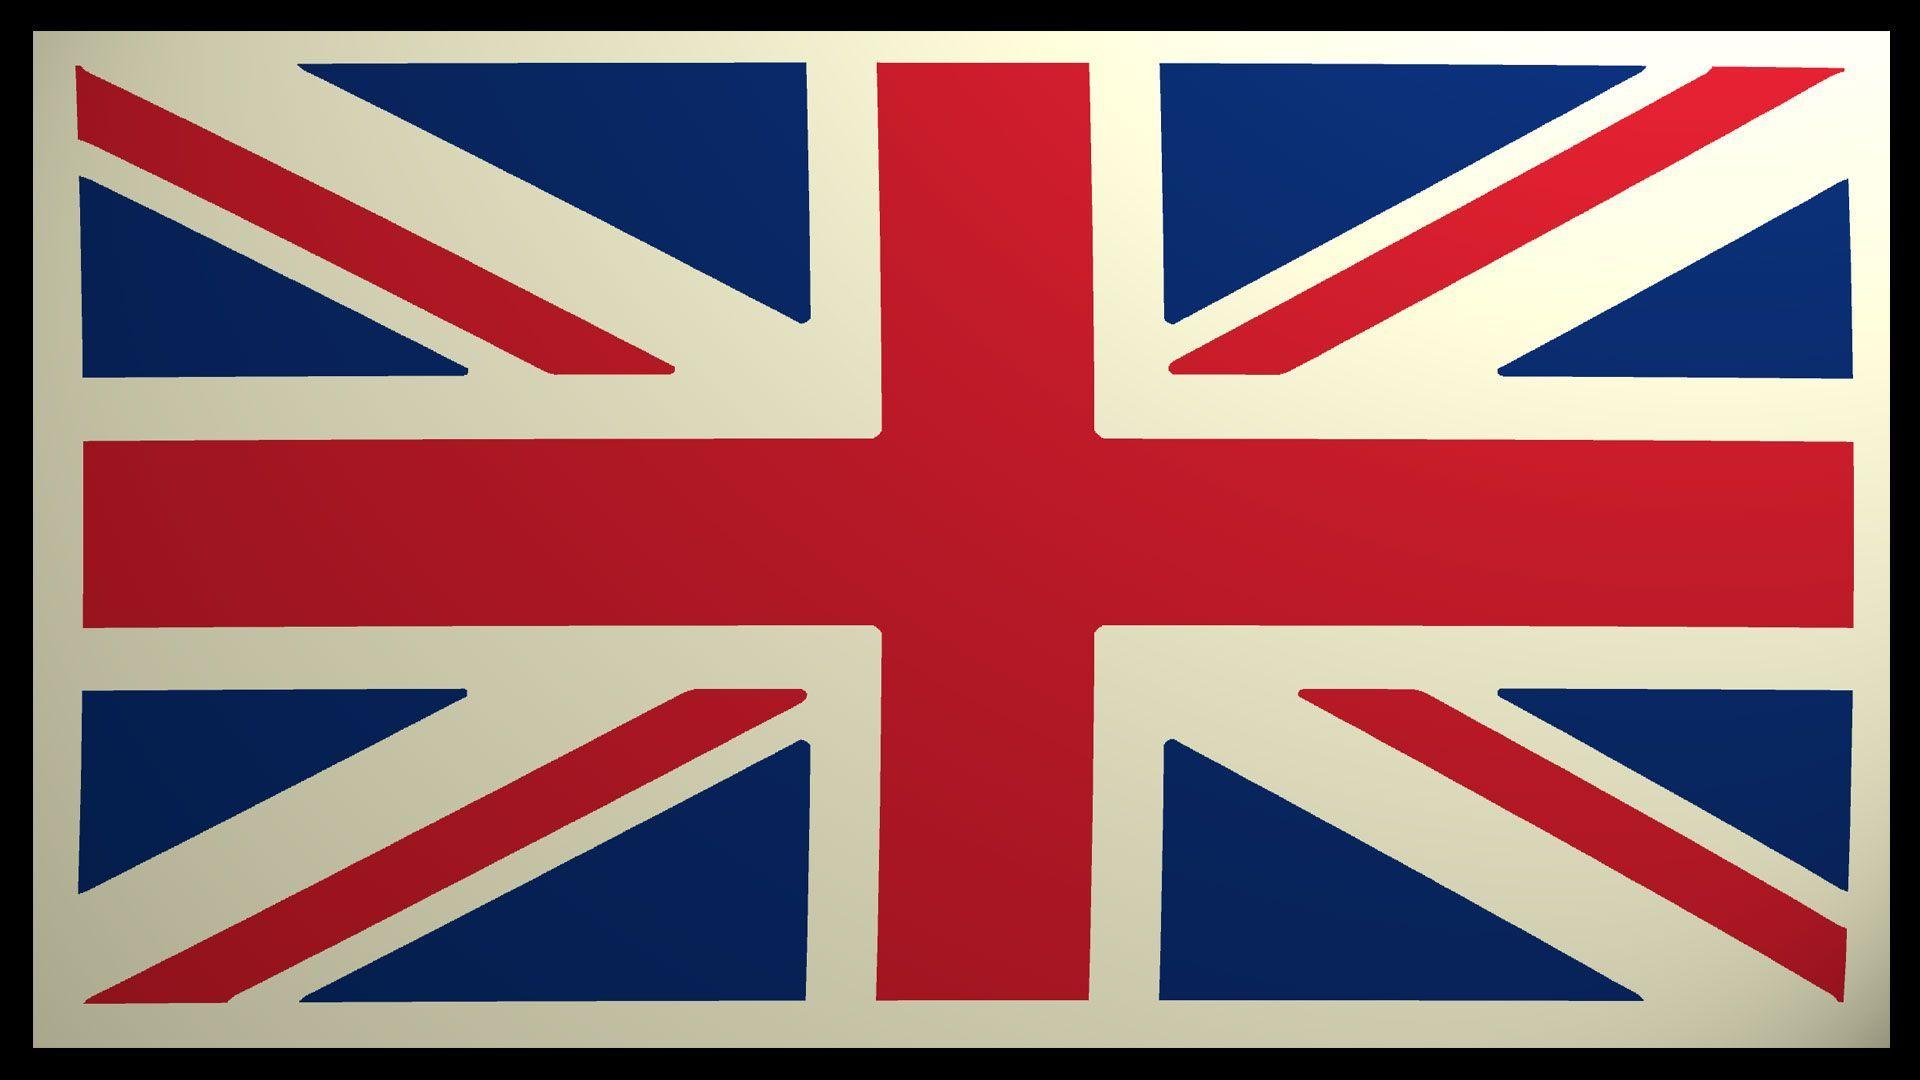 Ireland Flag Wallpaper Iphone Pictures Ireland Flag Wallpaper